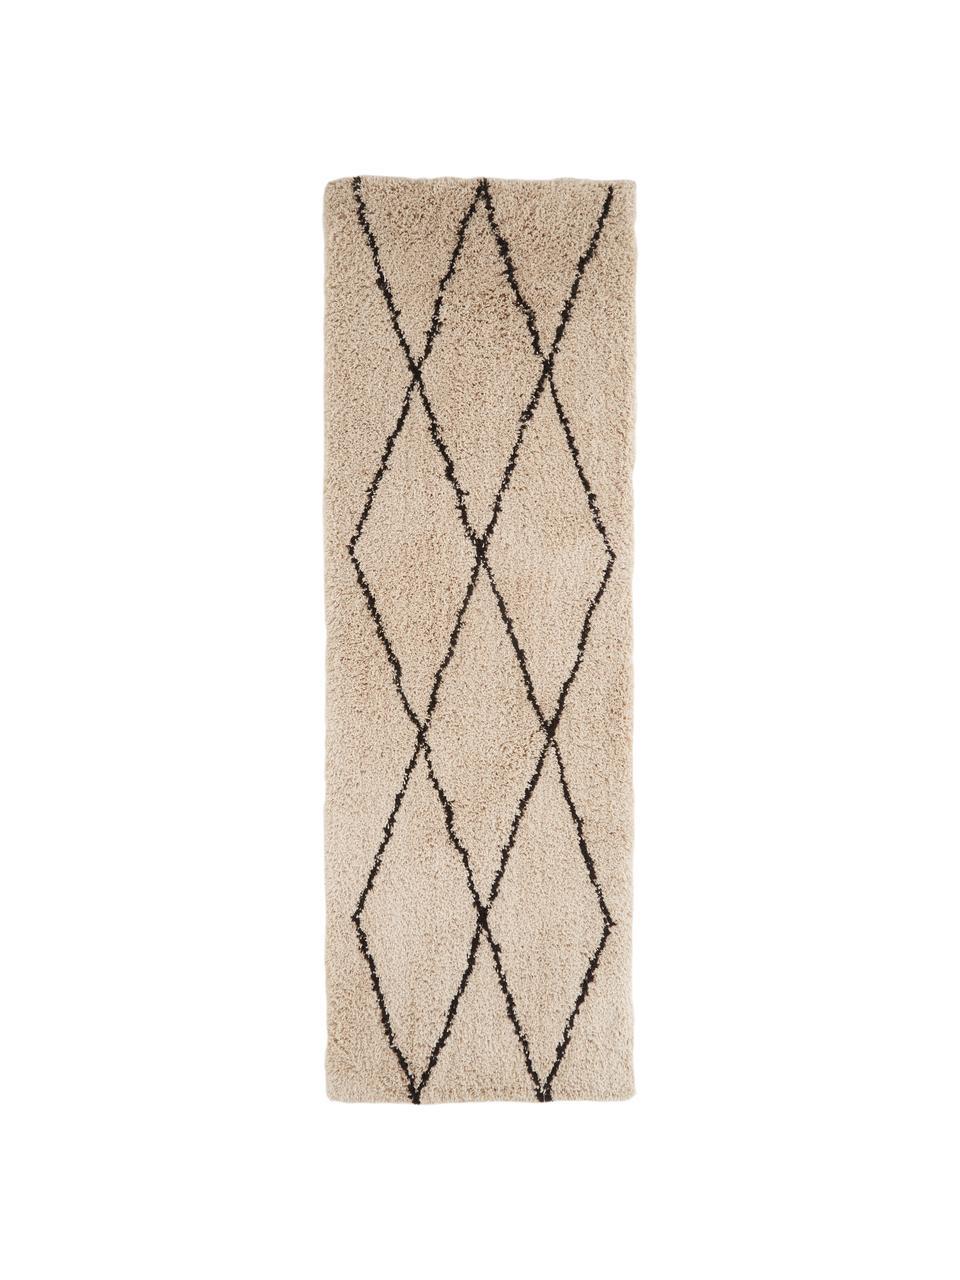 Passatoia tessuta a mano Nouria, Retro: 100% cotone, Beige, nero, Larg. 80 x Lung. 250 cm